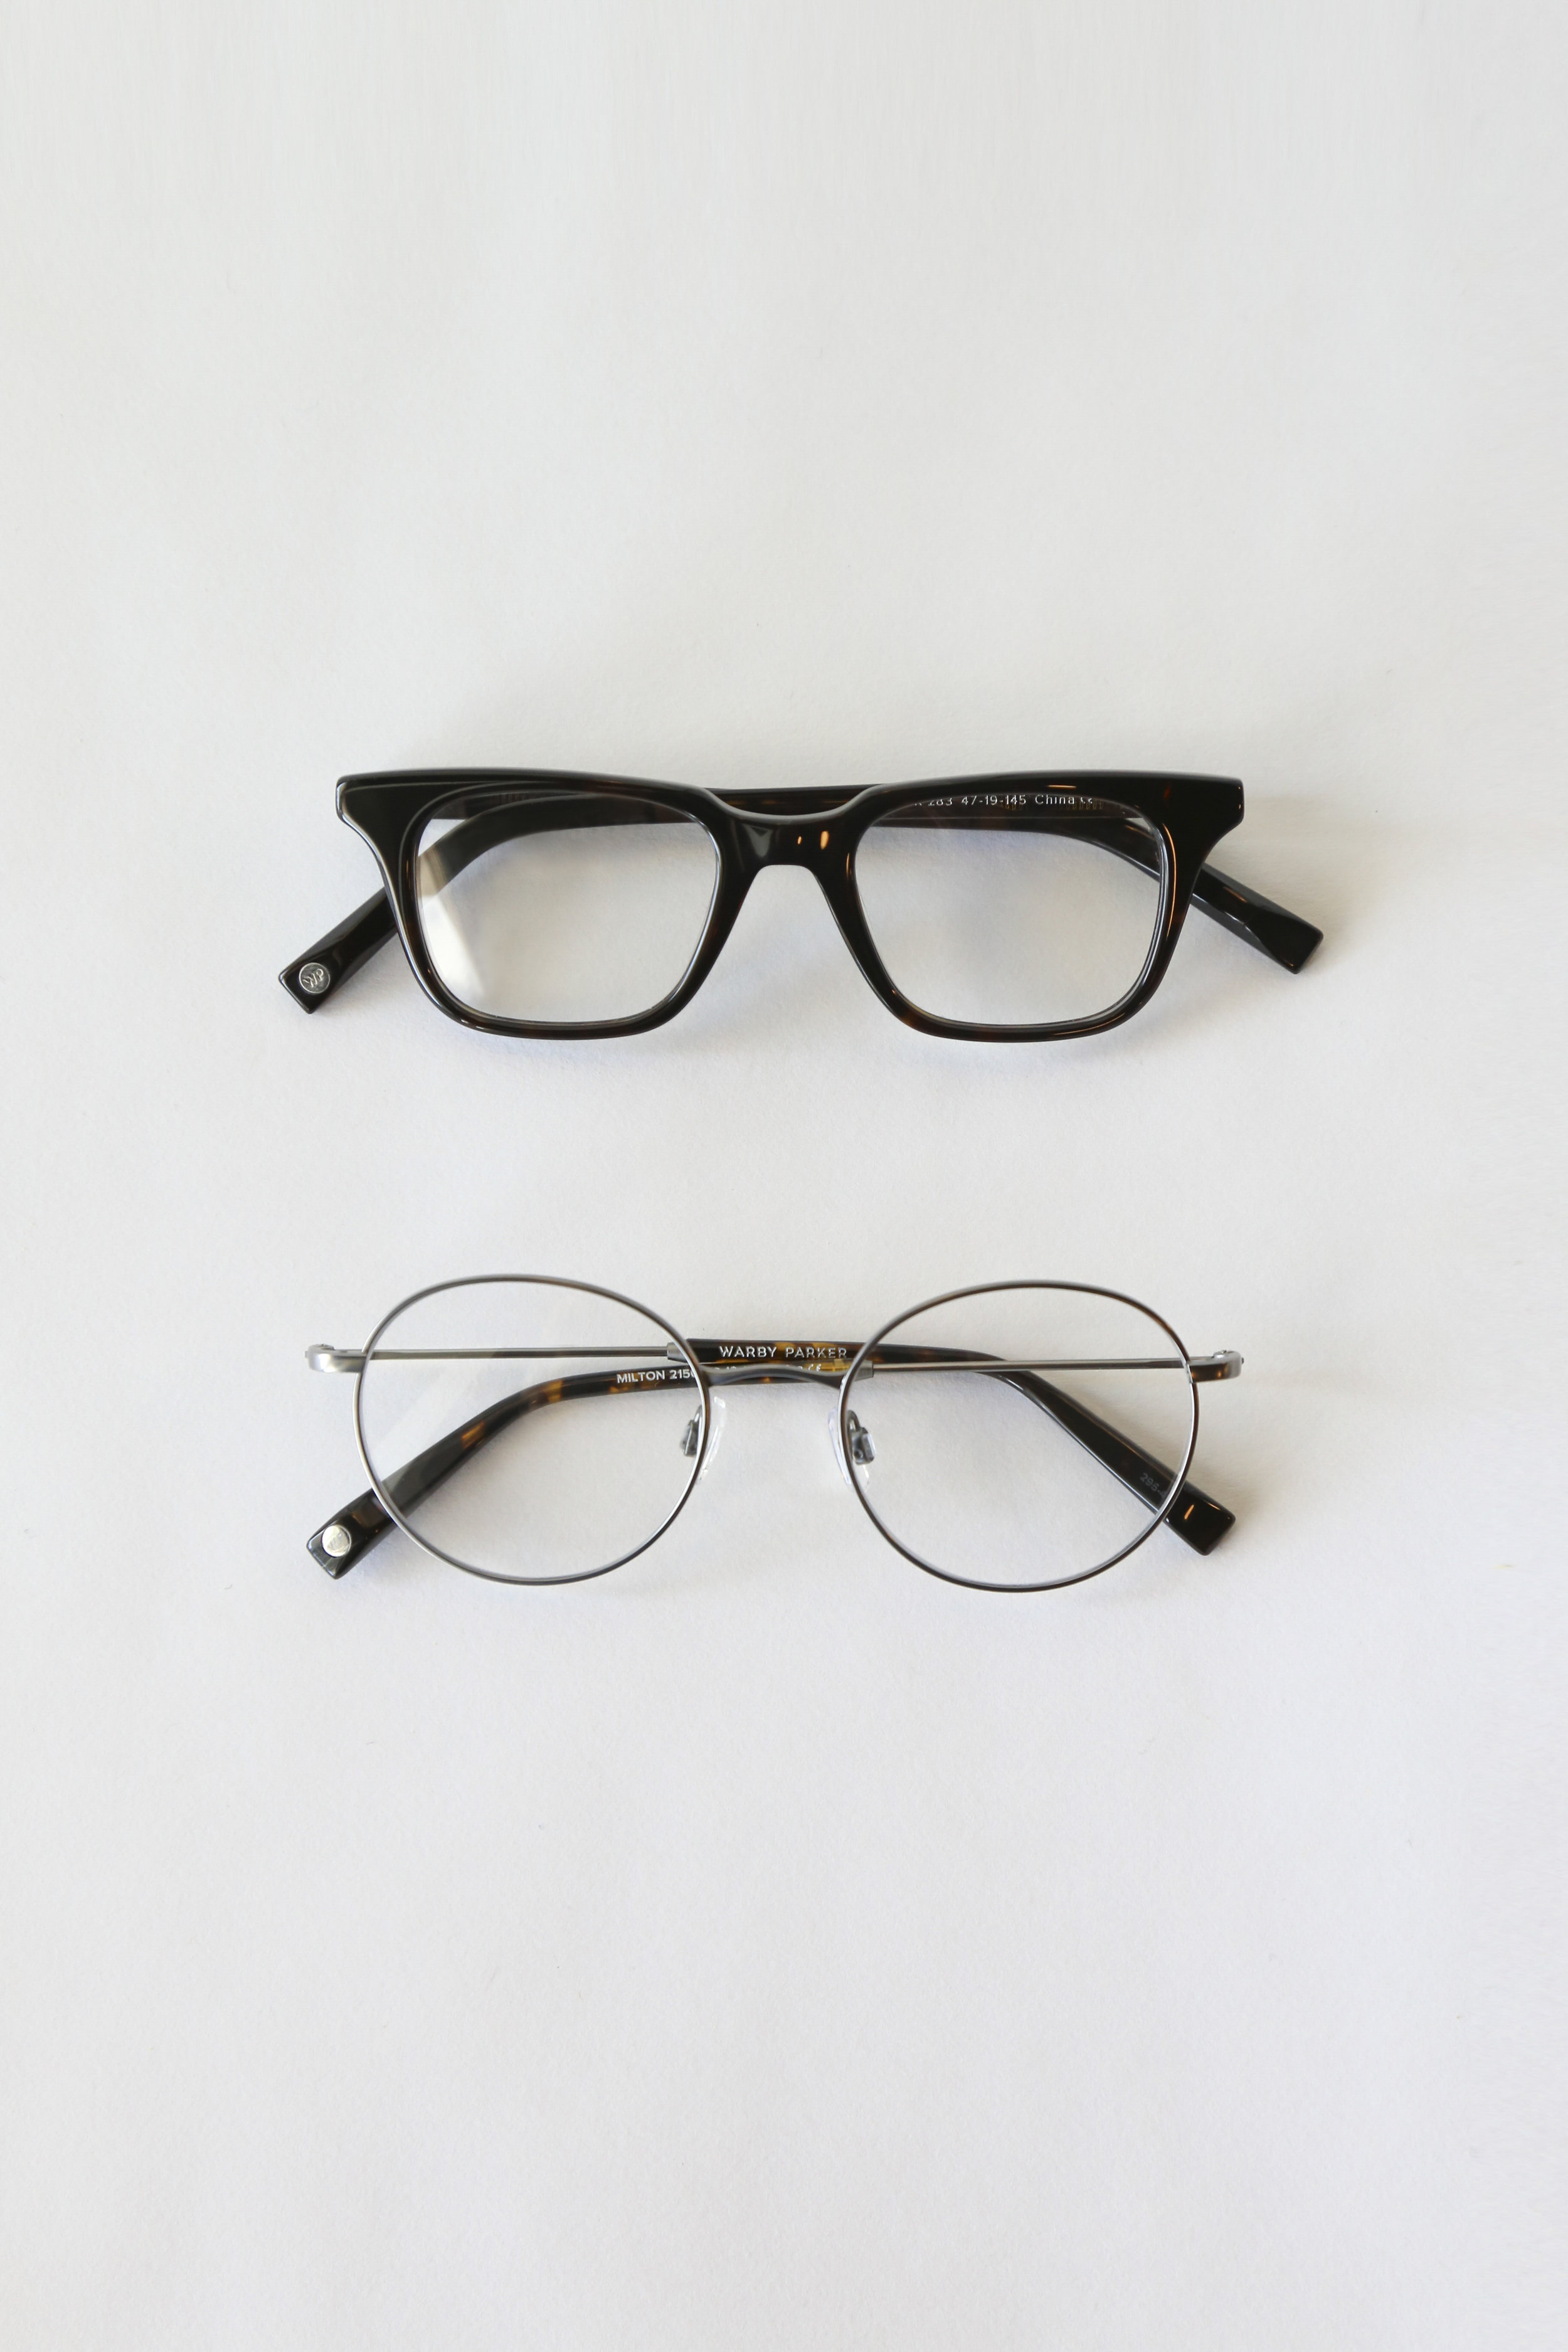 WARBY PARKER  Vintage Inspired Eyewear